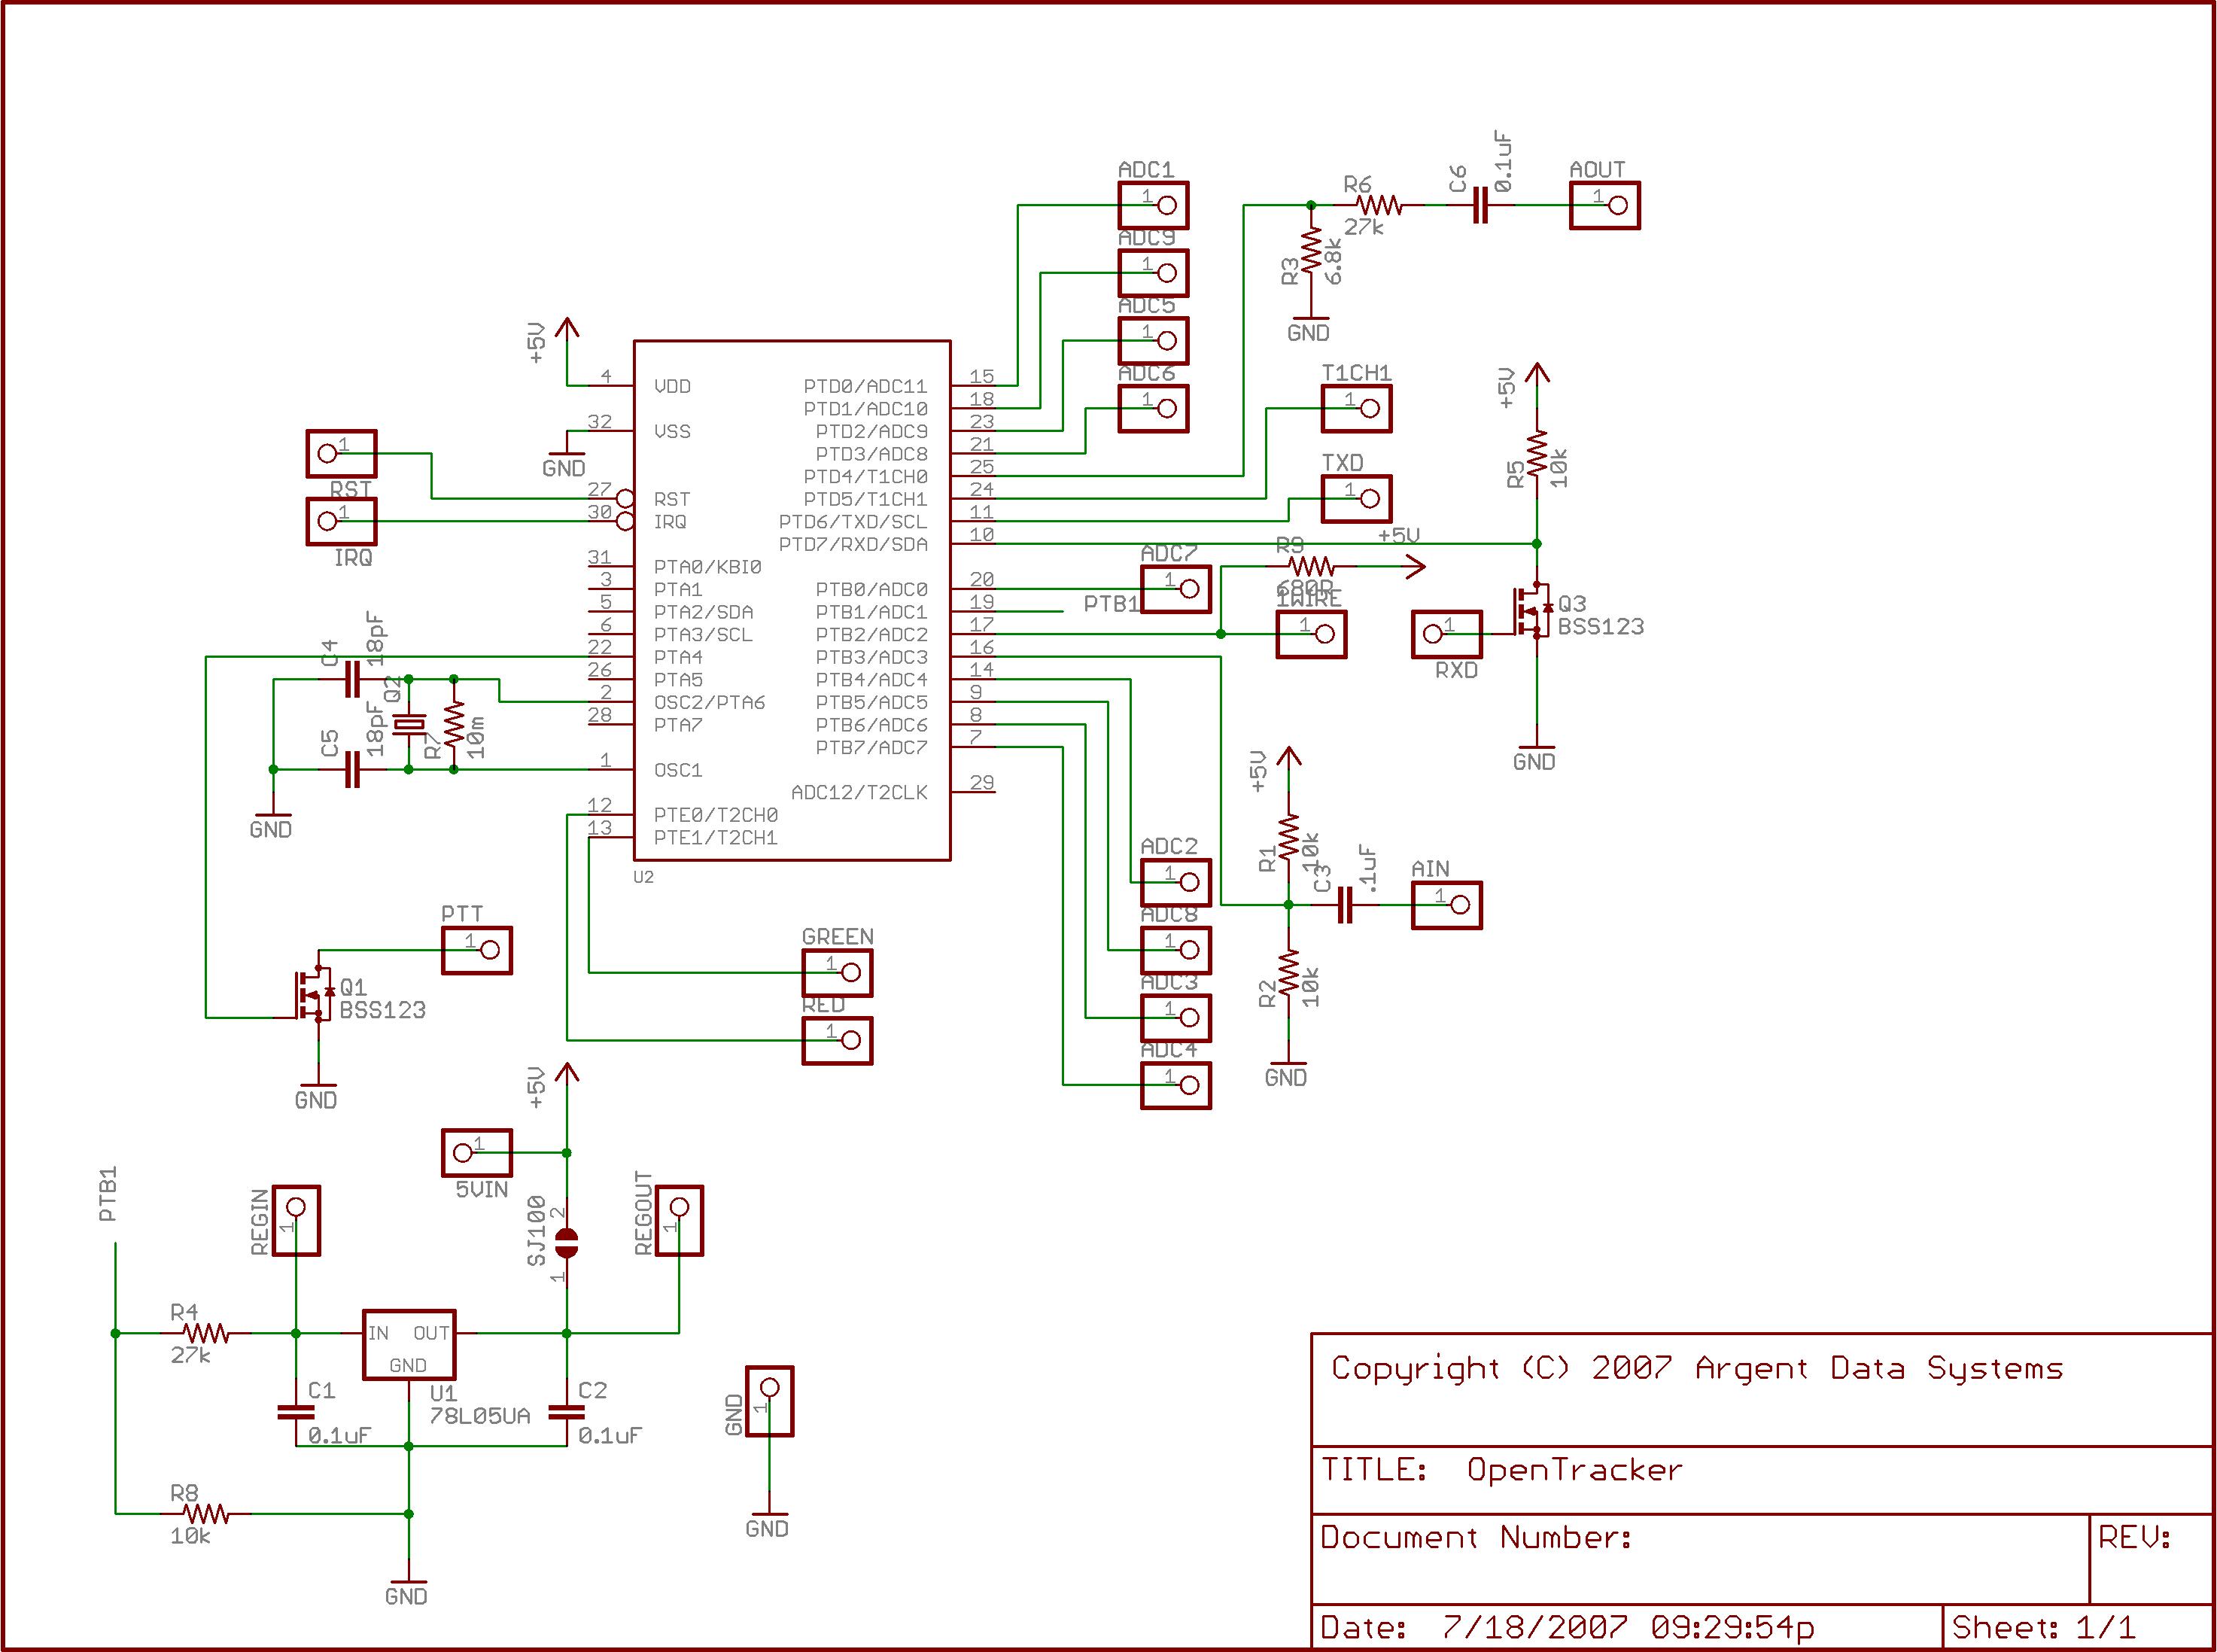 Opentracker Manual Schematicrev4